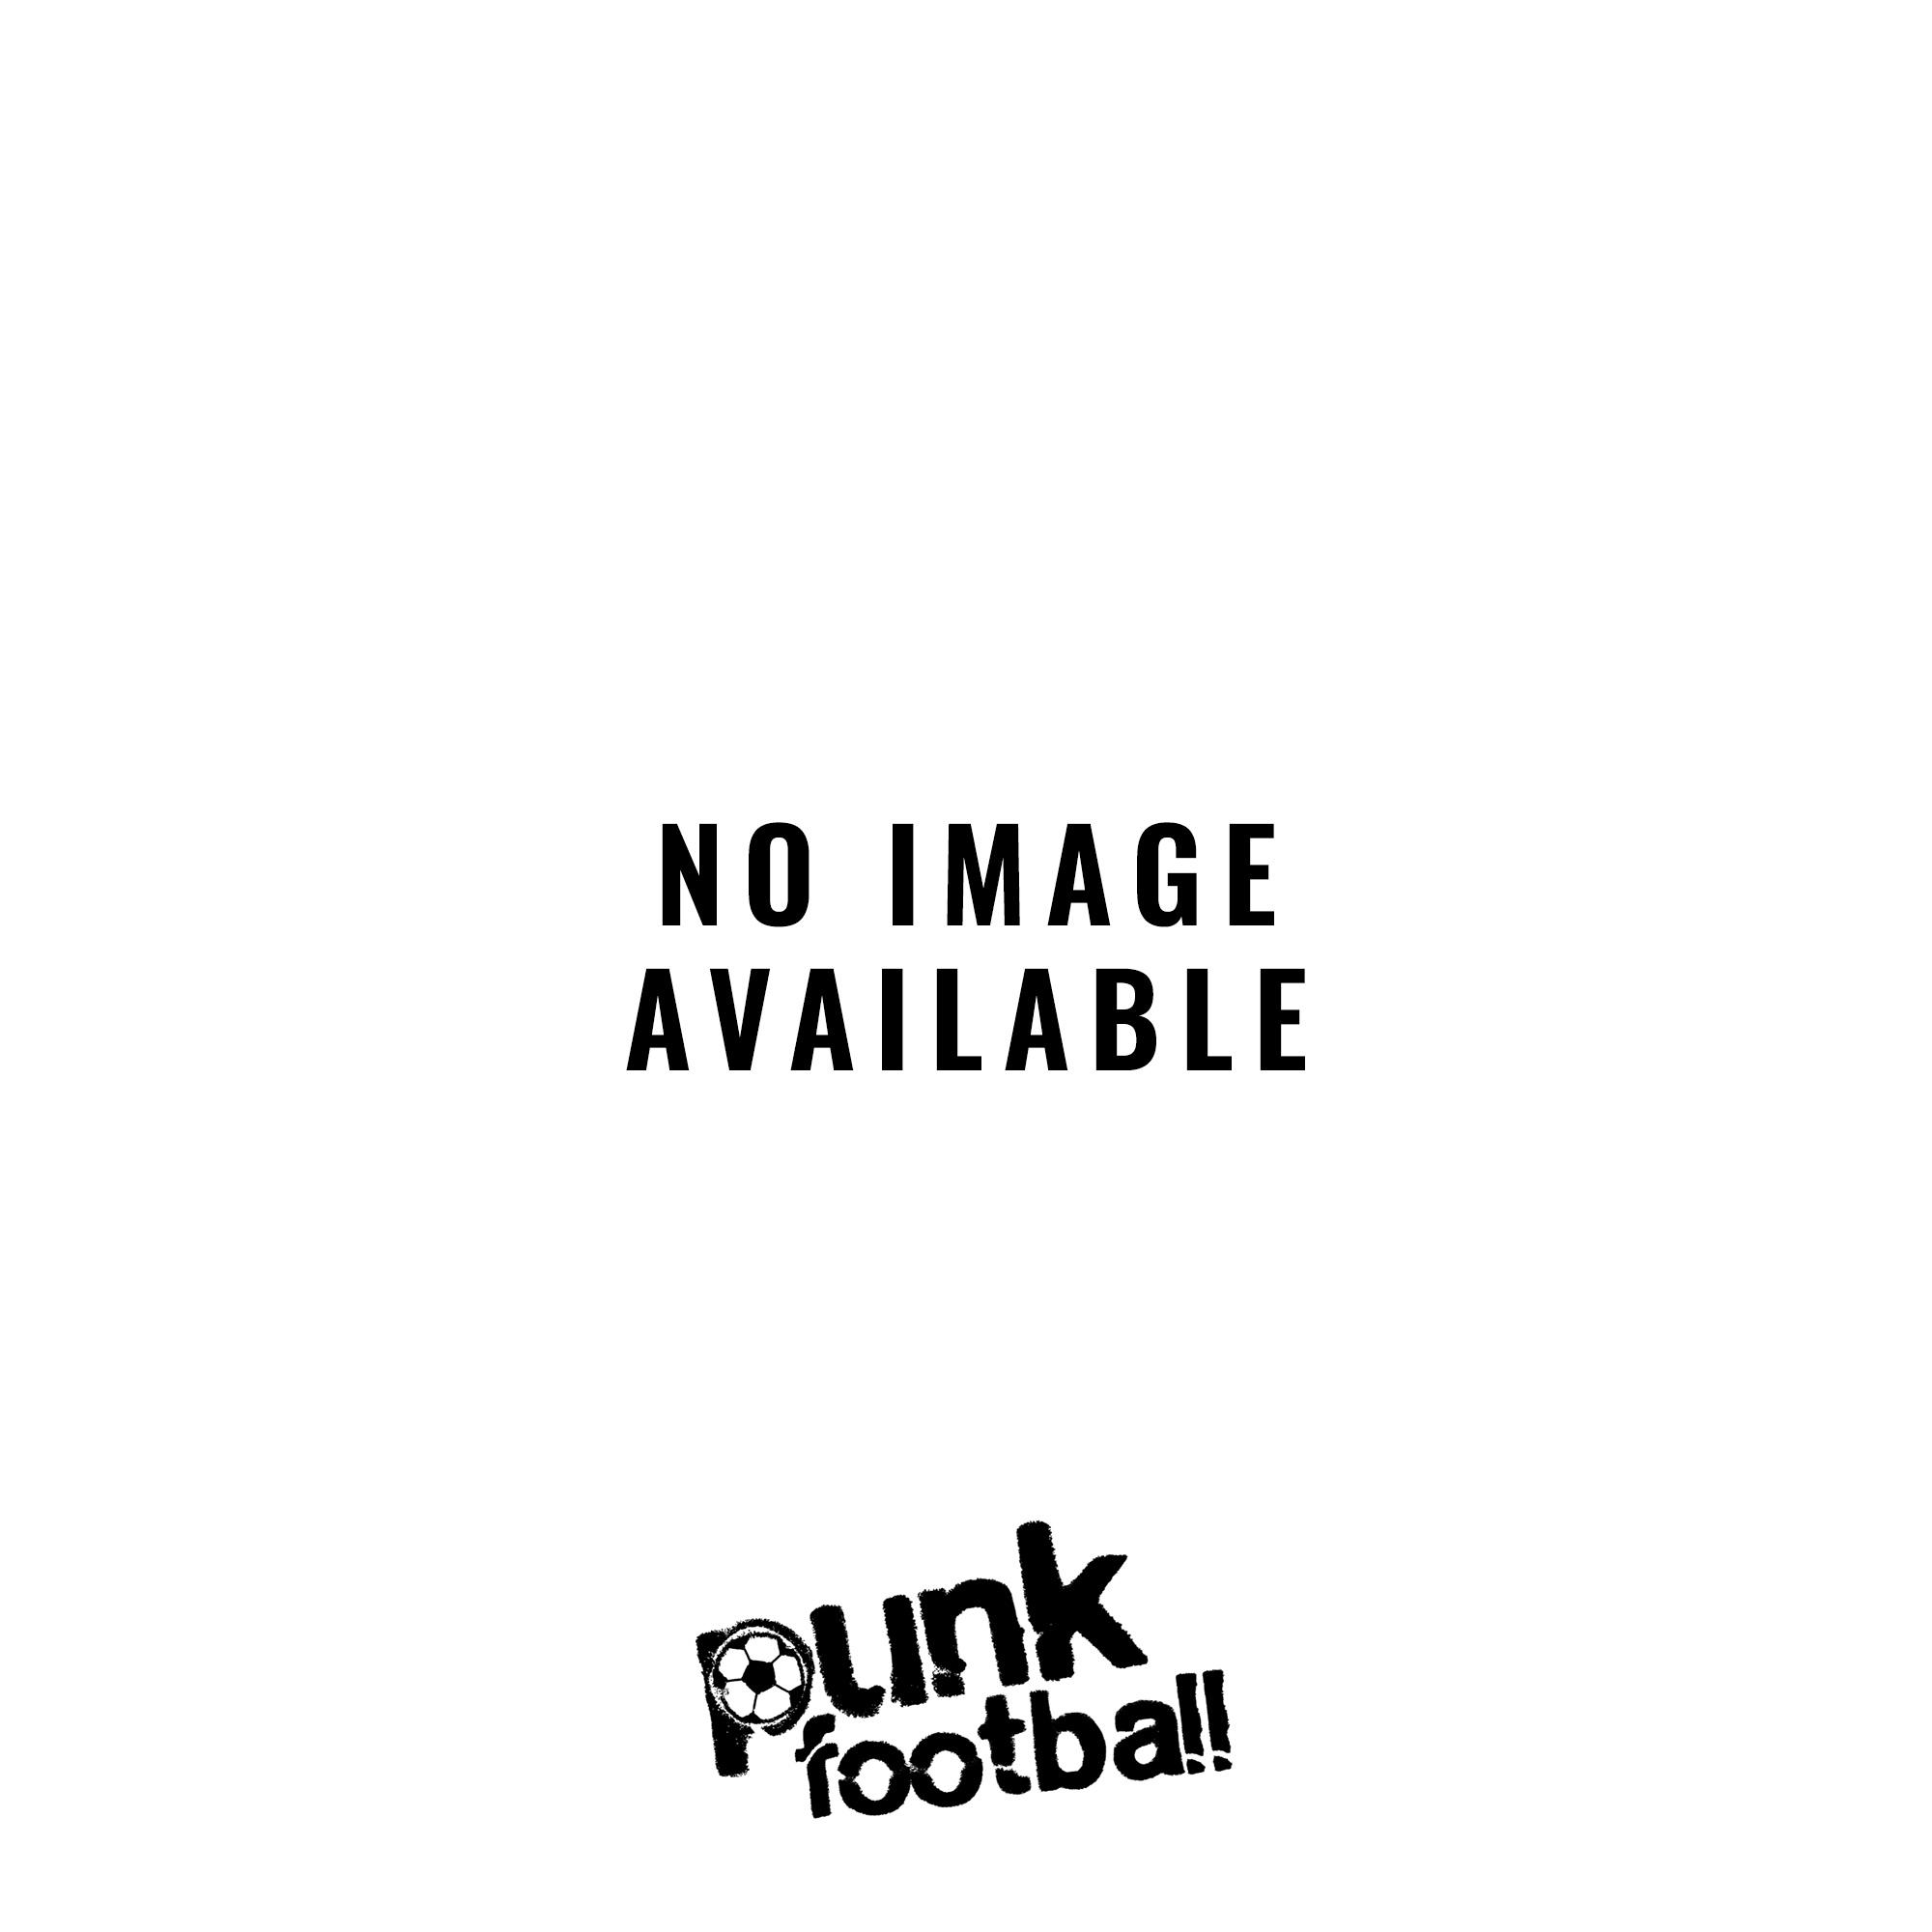 The North West (Everton) Hooded Sweatshirt